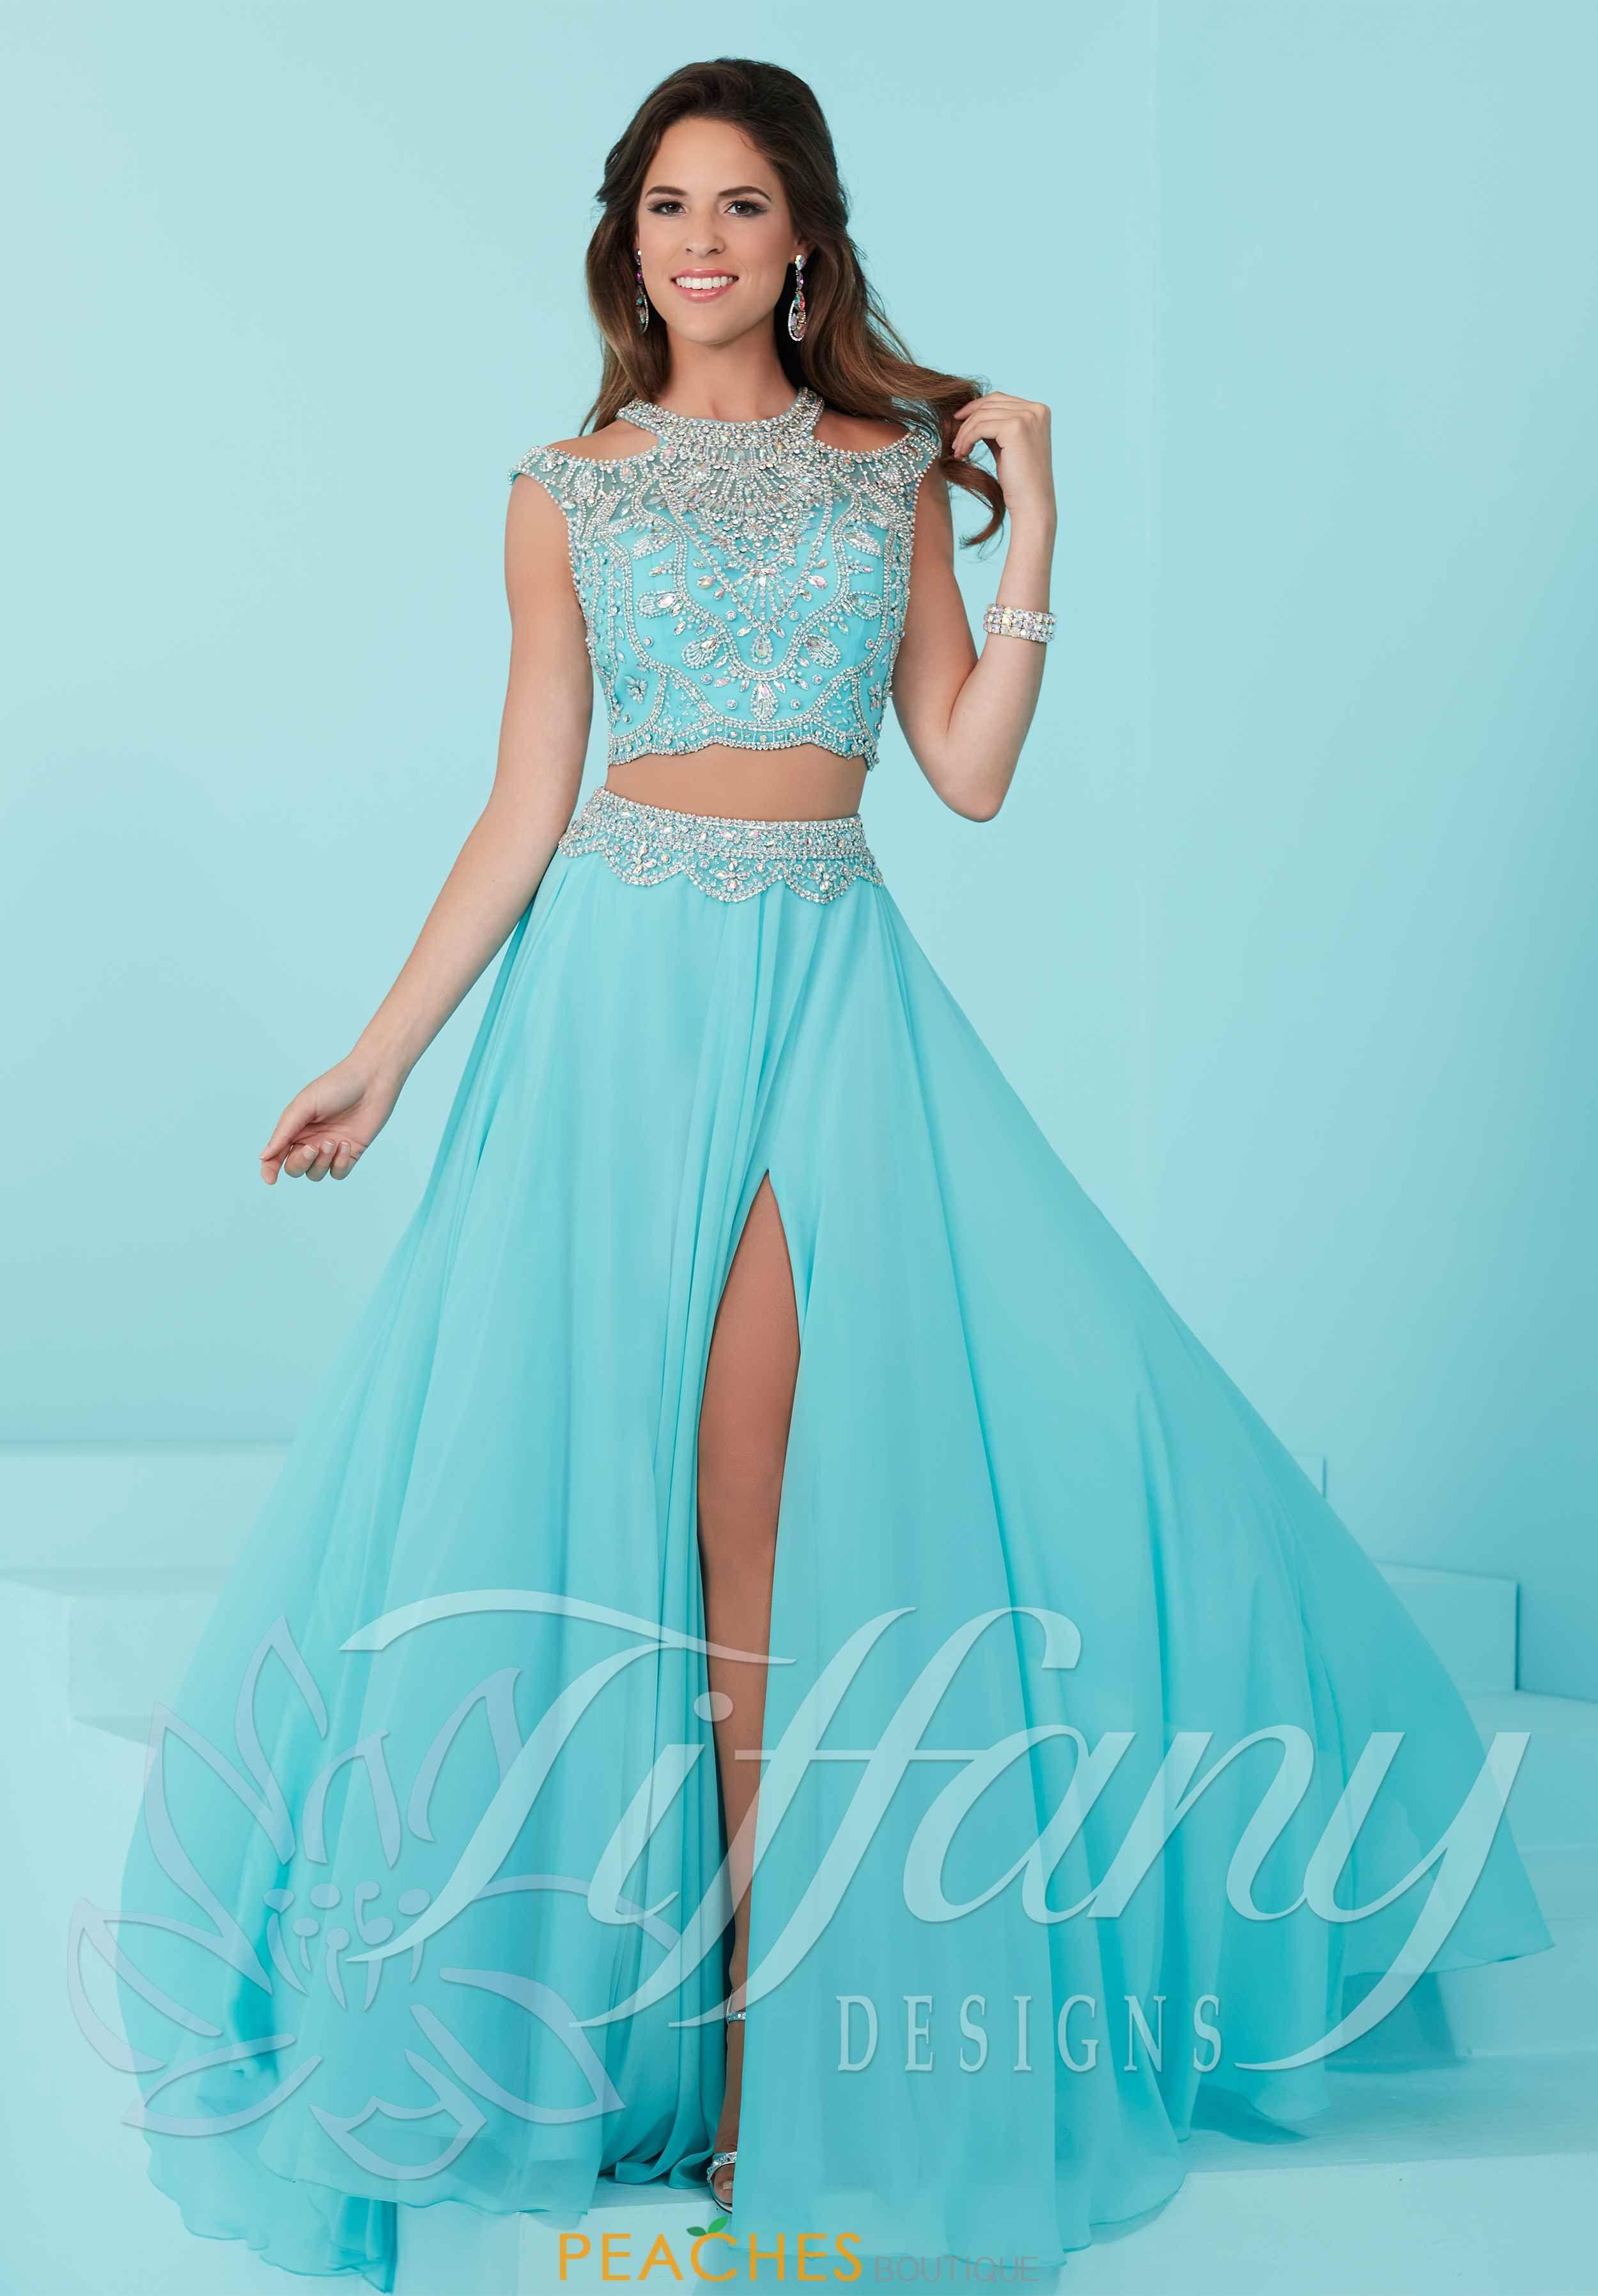 Amazing Prom Dresses In Amarillo Tx Crest - Wedding Dress Ideas ...